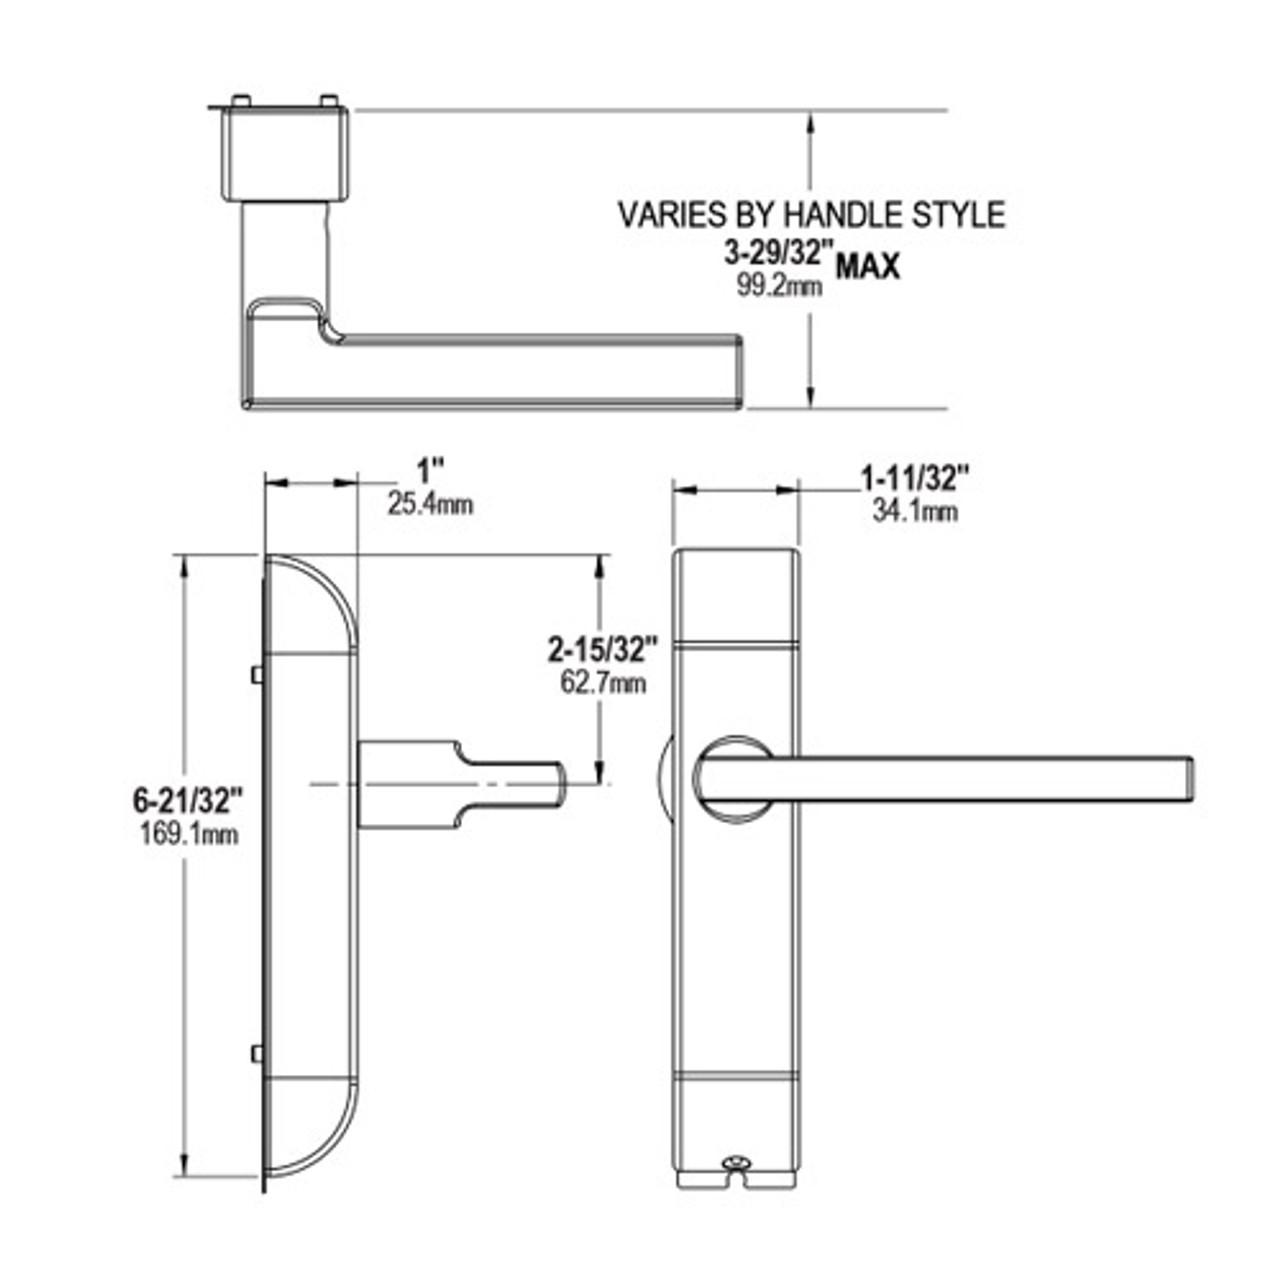 4600M-MV-522-US32D Adams Rite MV Designer handle Dimensional View